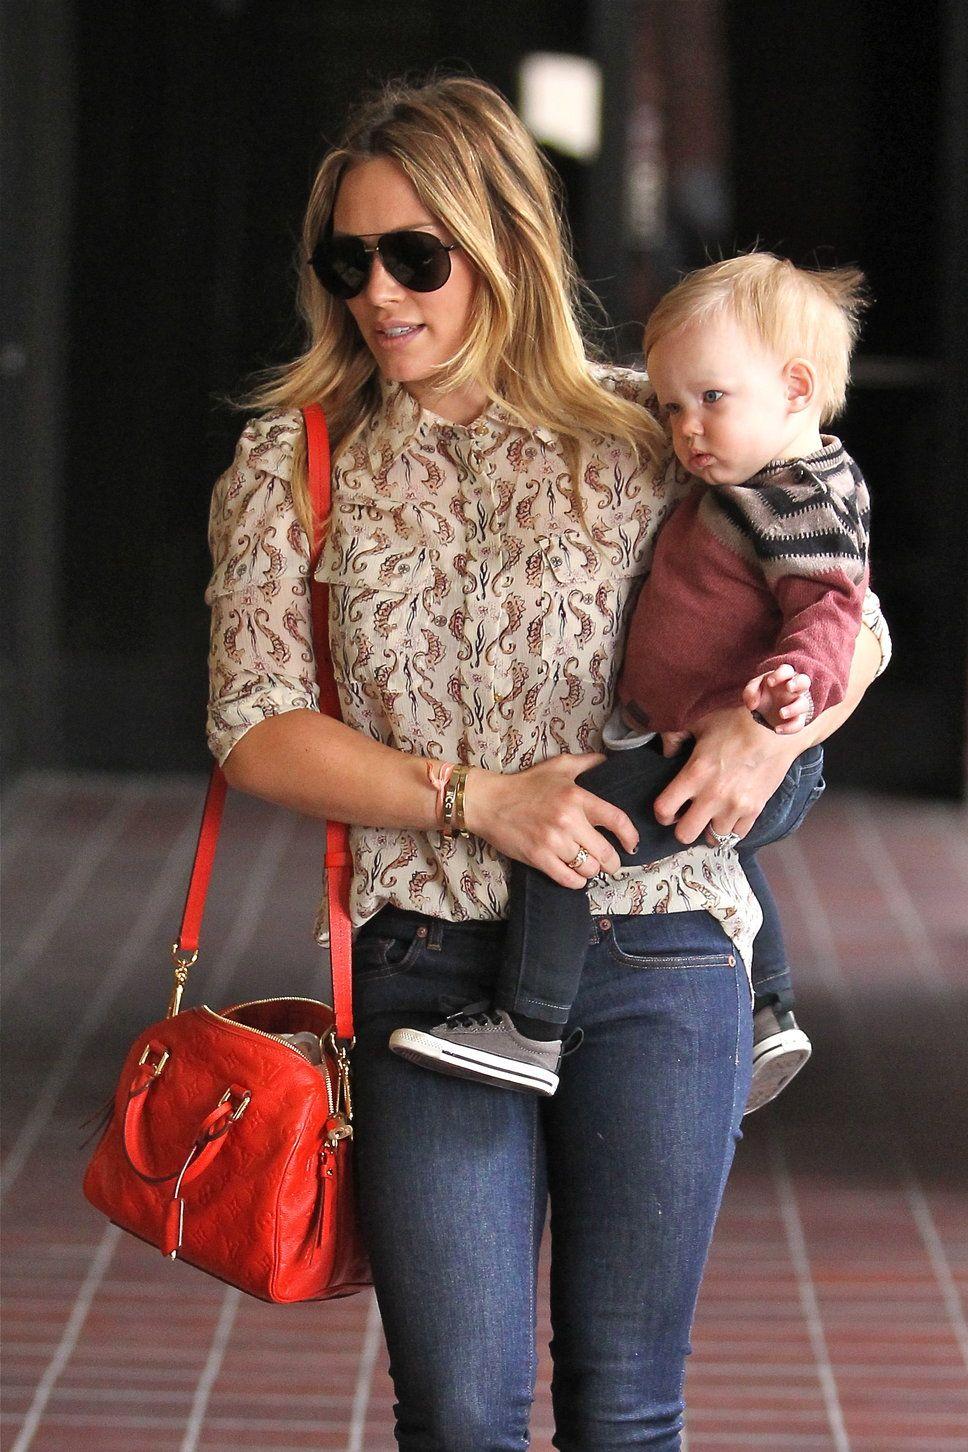 Hilary Duff s new Louis Vuitton Speedy bag cost her around  1 cf4ba8598577b